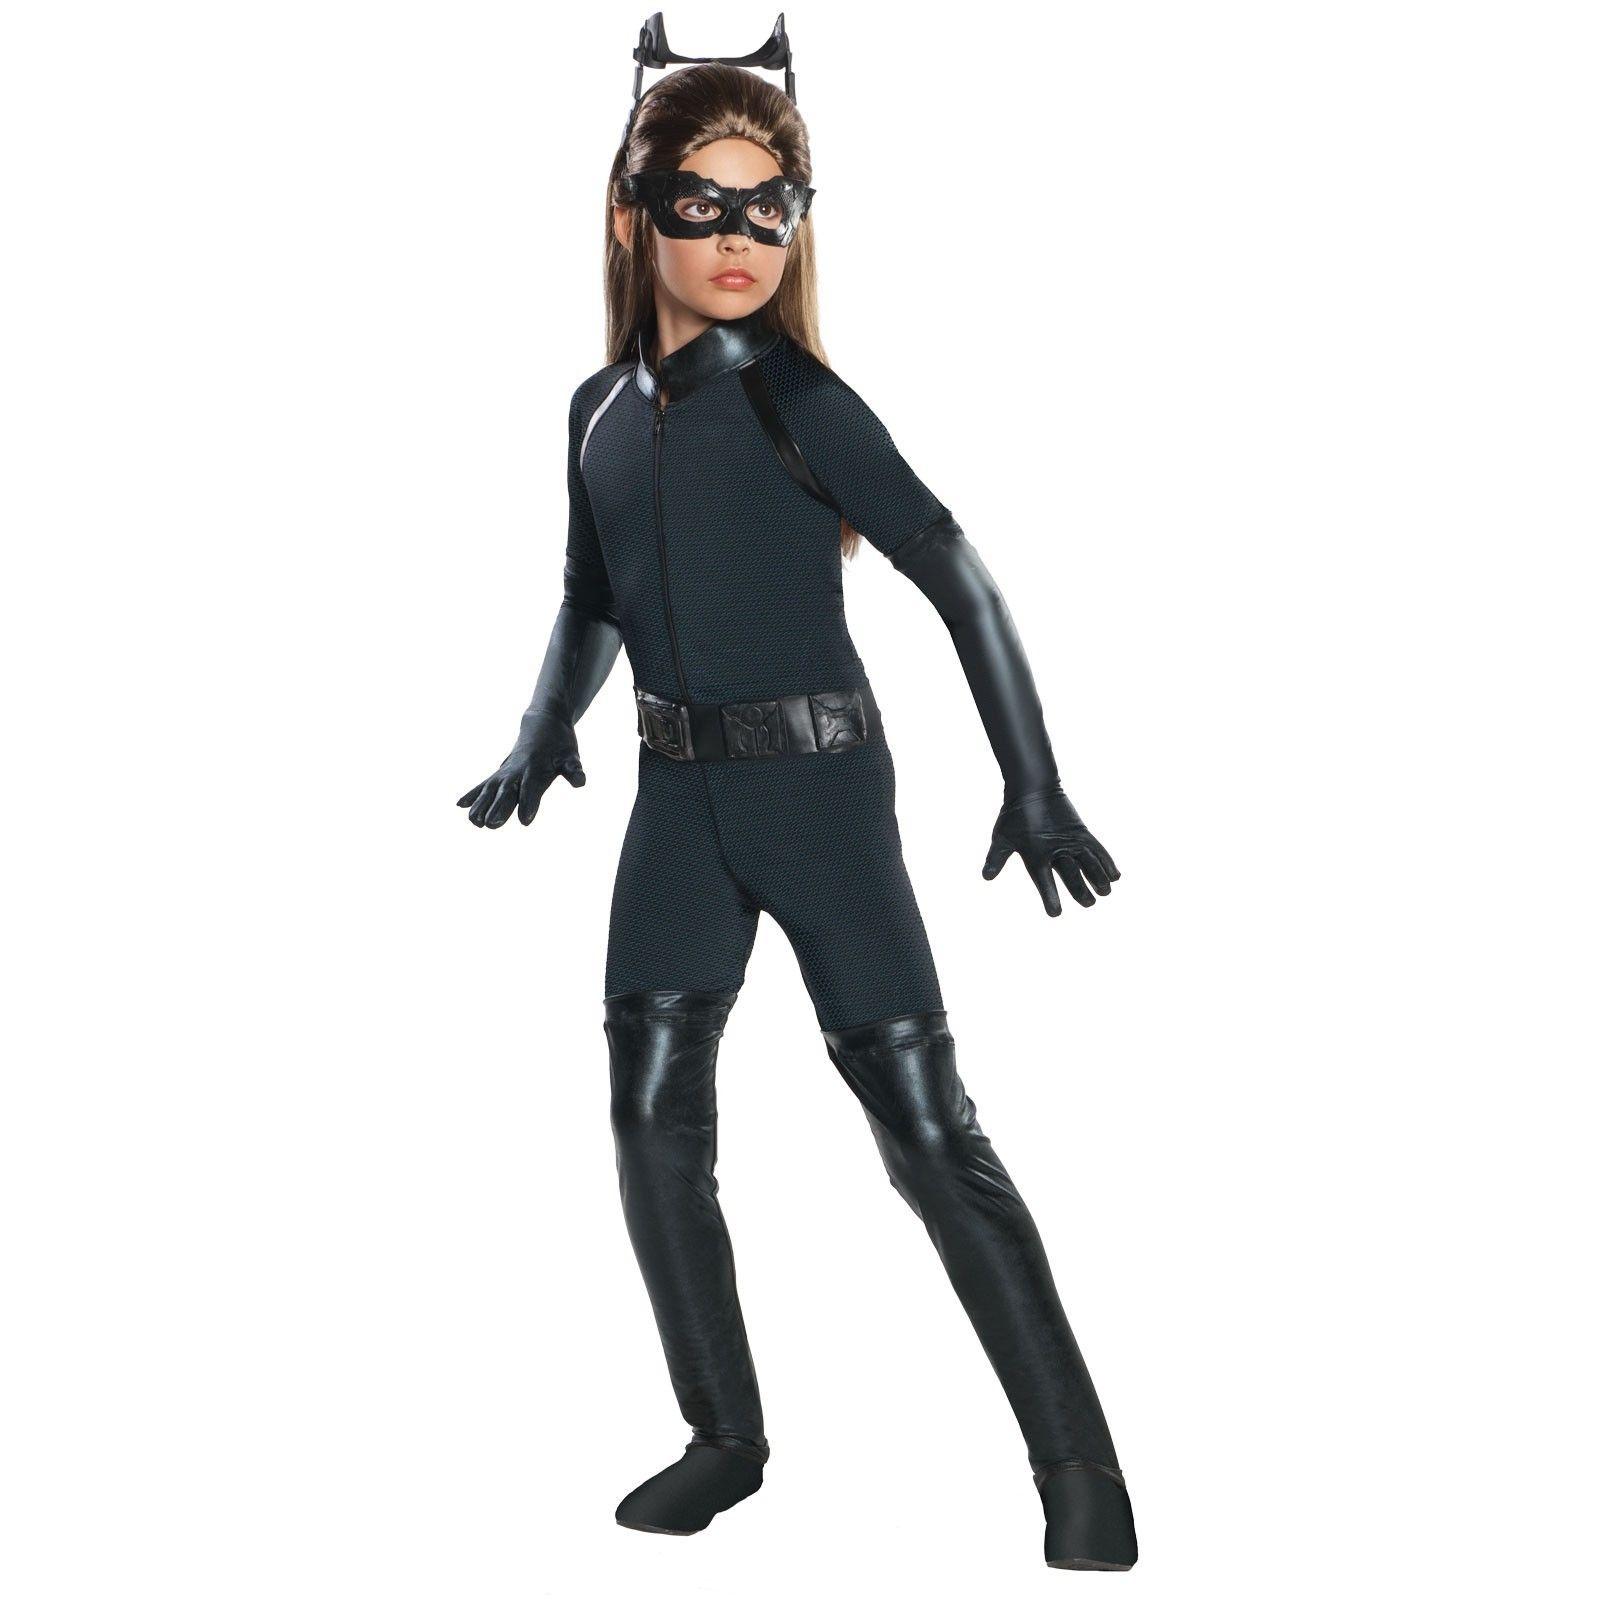 Deluxe Joker Licensed Batman The Dark Knight Kids Costume